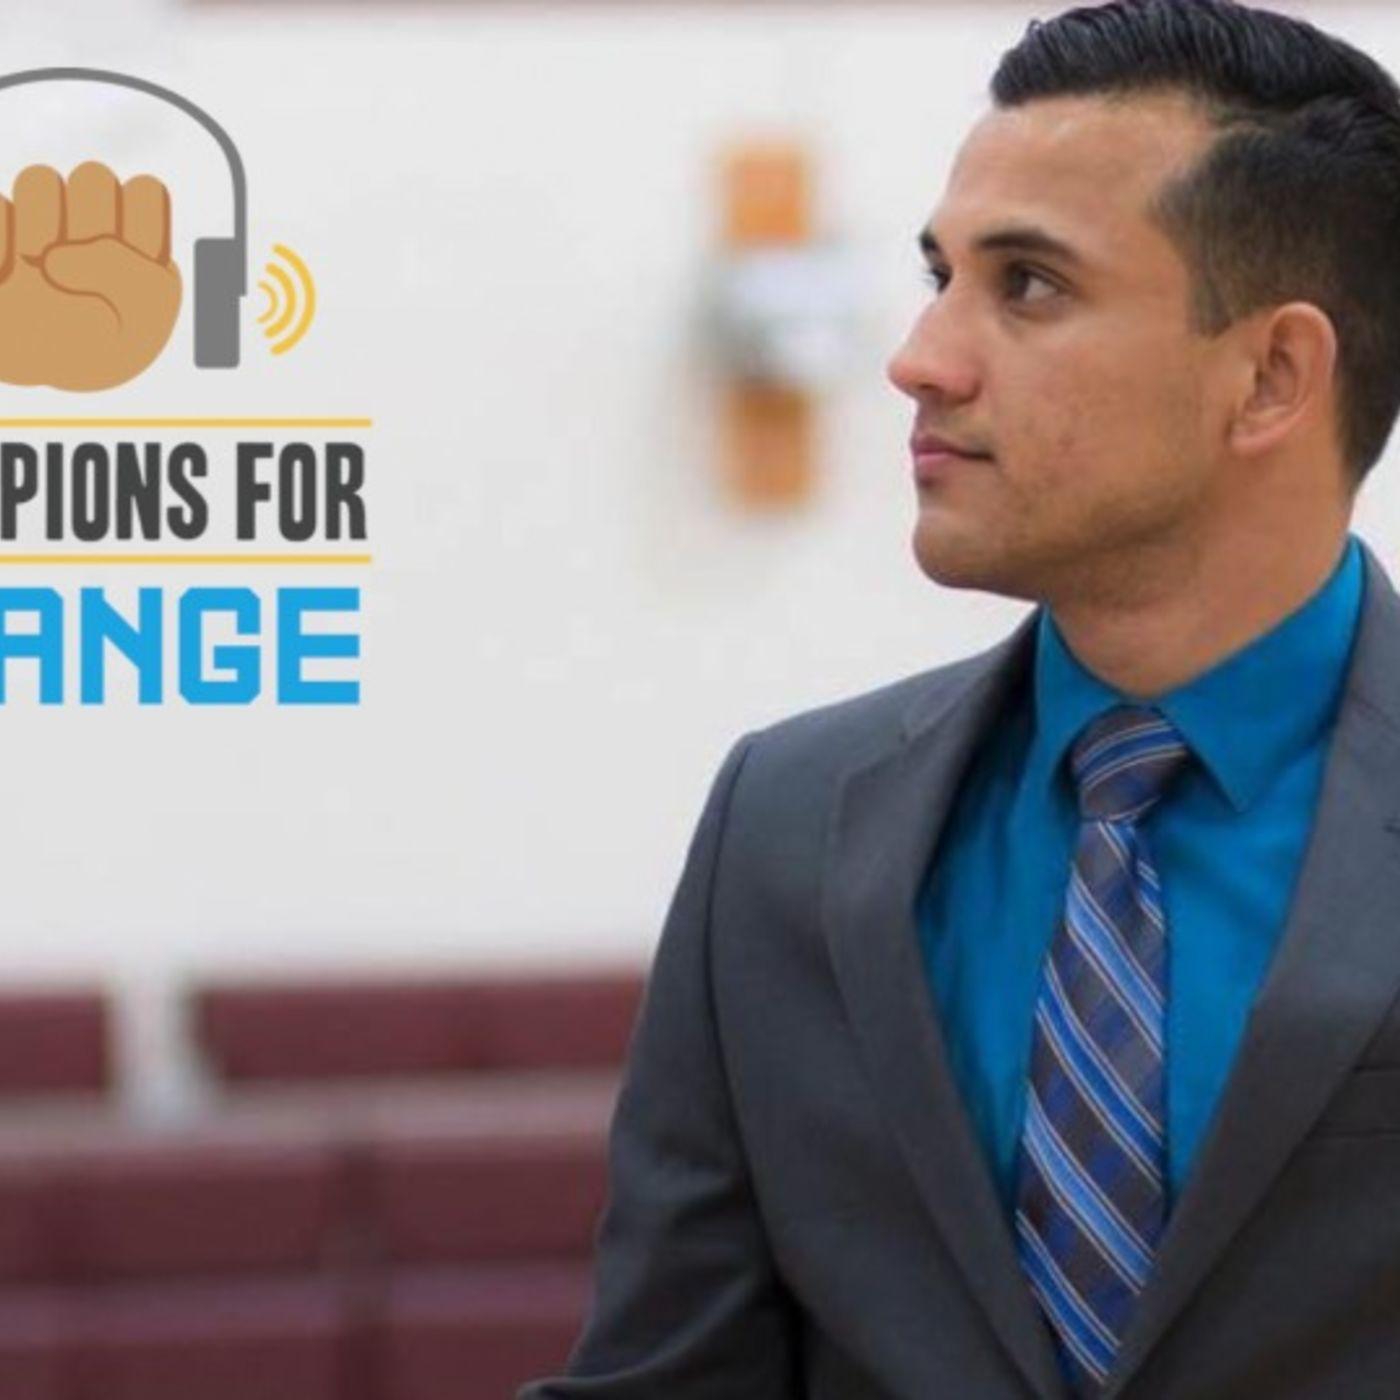 Podcast #4 - Champions for Change - José Luis Zelaya